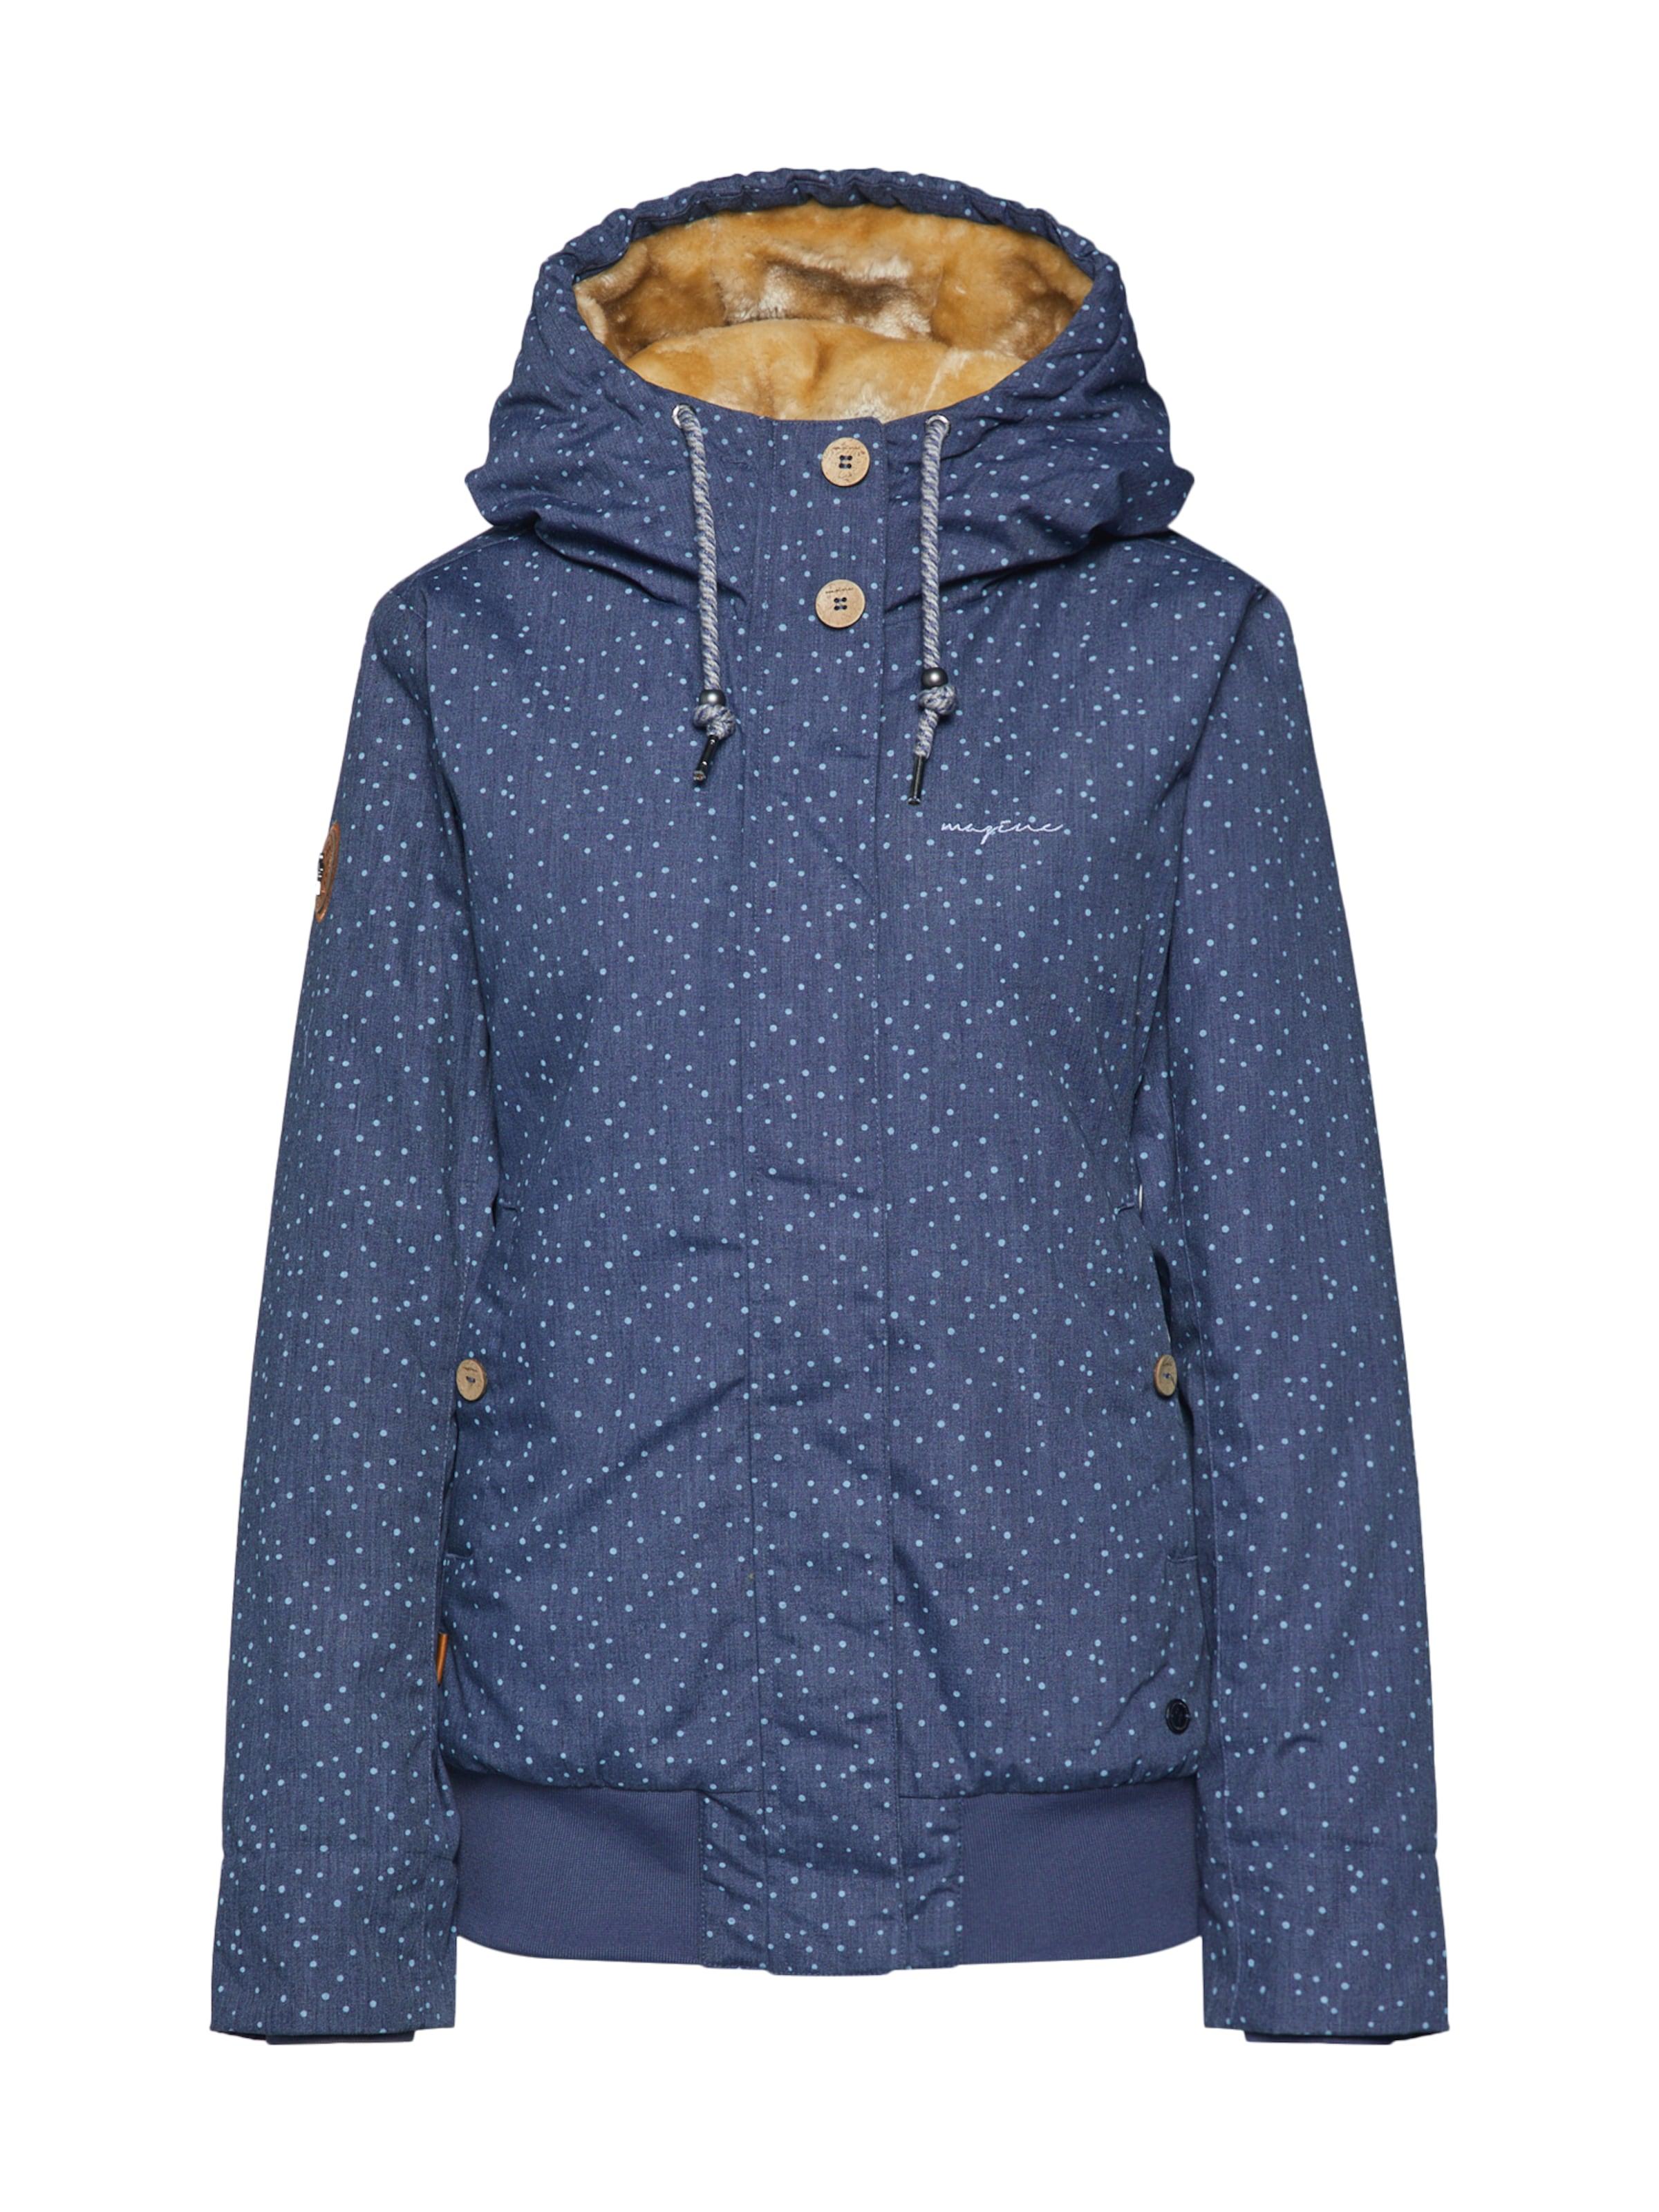 Blau Jacke Jacke Blau Jacke Mazine Jacke In Mazine In In In Blau Mazine Mazine hxtsrdCQ